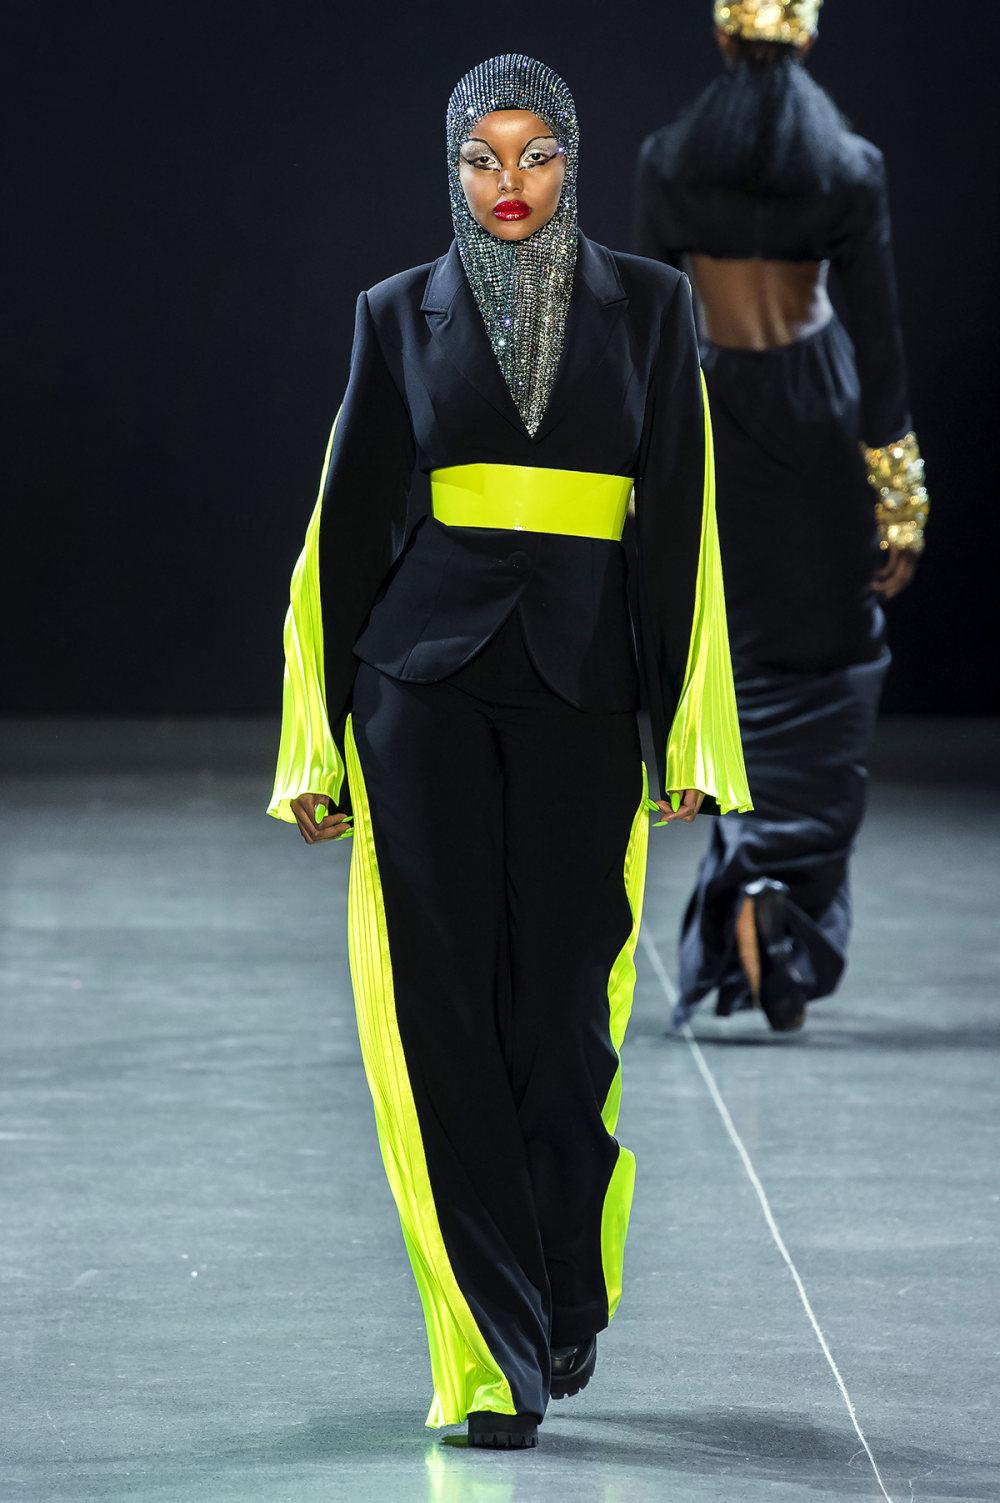 Christian Cowan时装系列虽然巨大的薄纱层状服装并没有那么特别-33.jpg